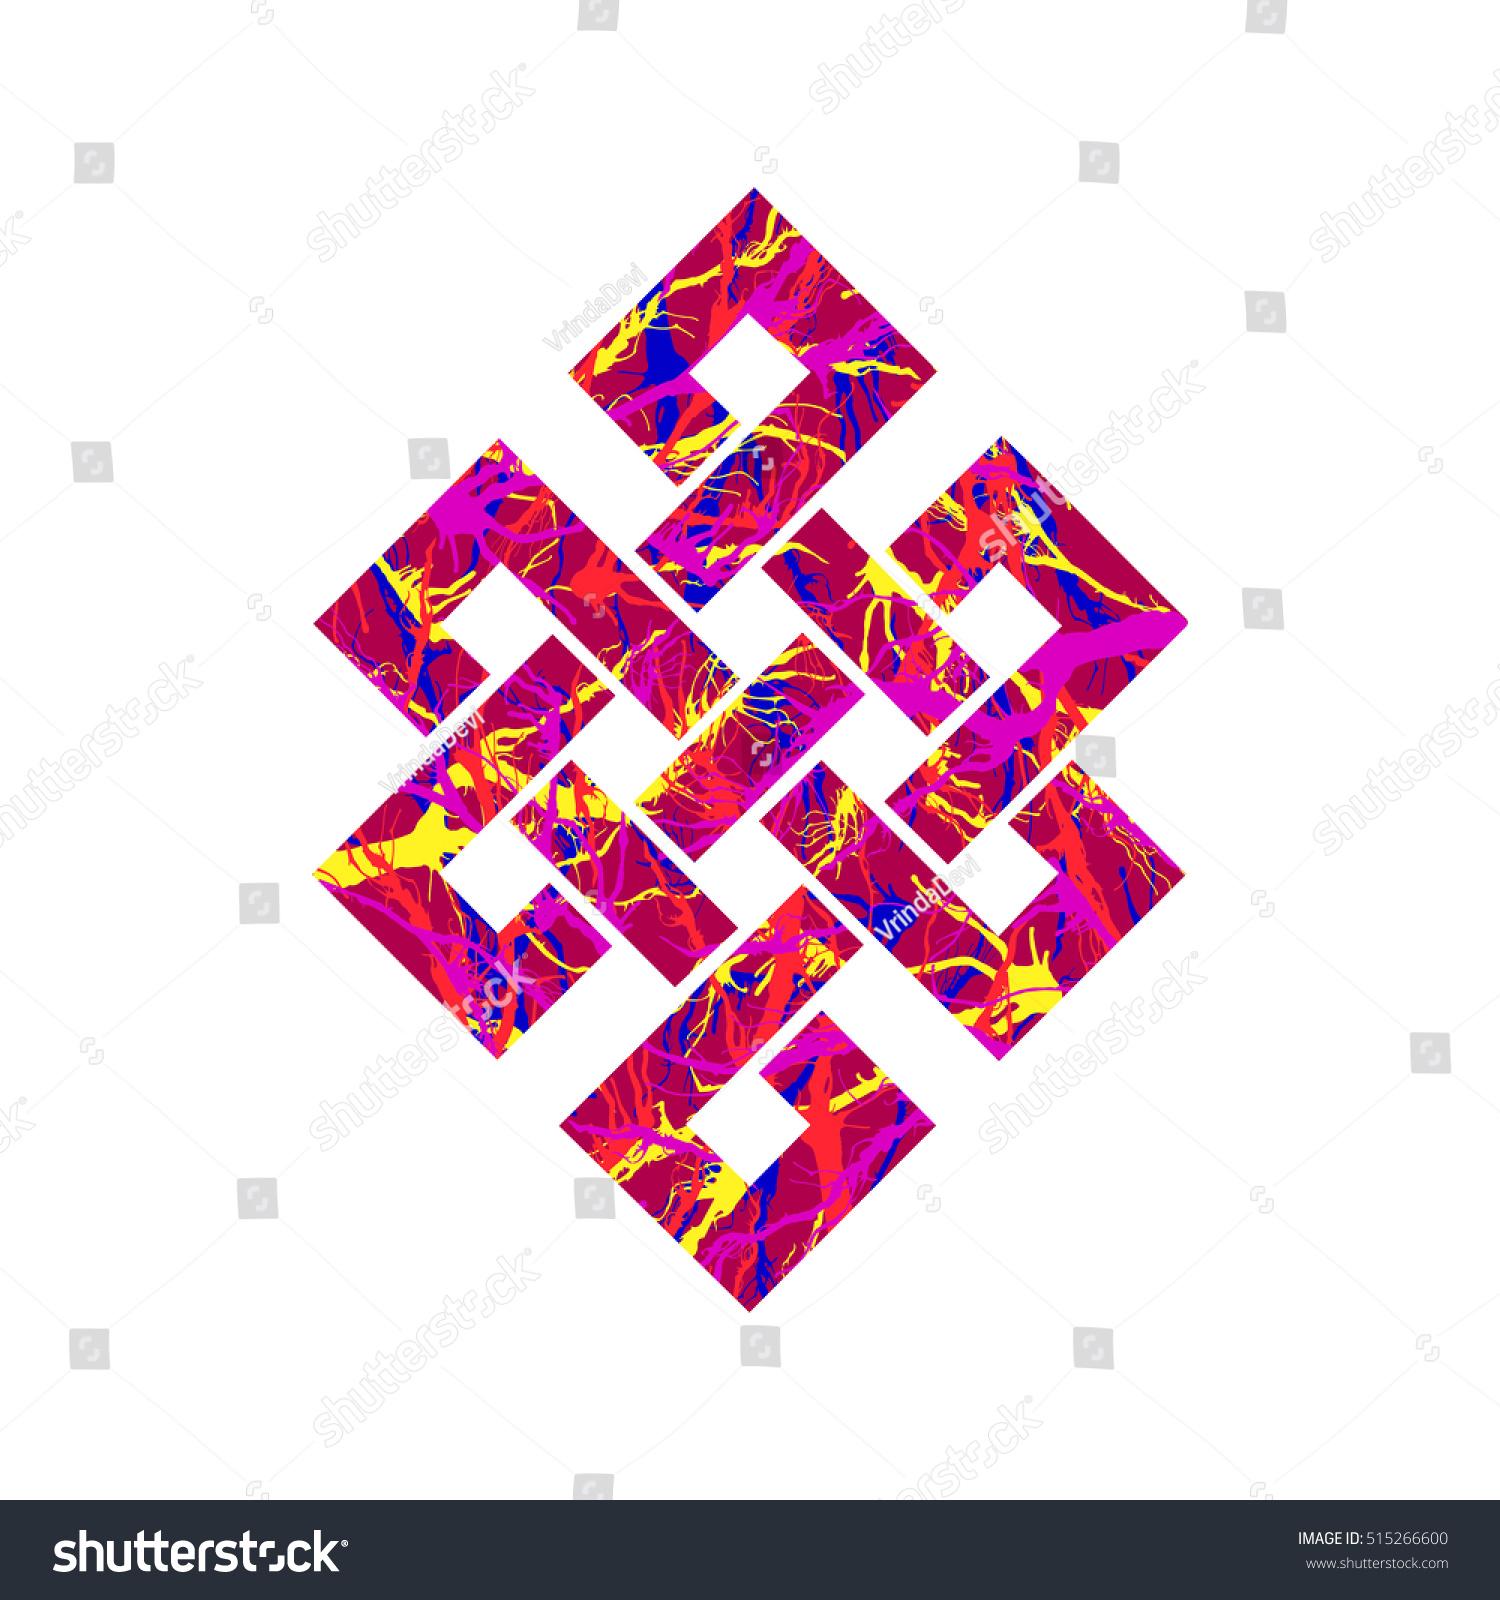 Eternity knot buddhist symbol vector illustration stock vector eternity knot buddhist symbol vector illustration colored textured eternity knot icon celtic irish pattern buycottarizona Image collections